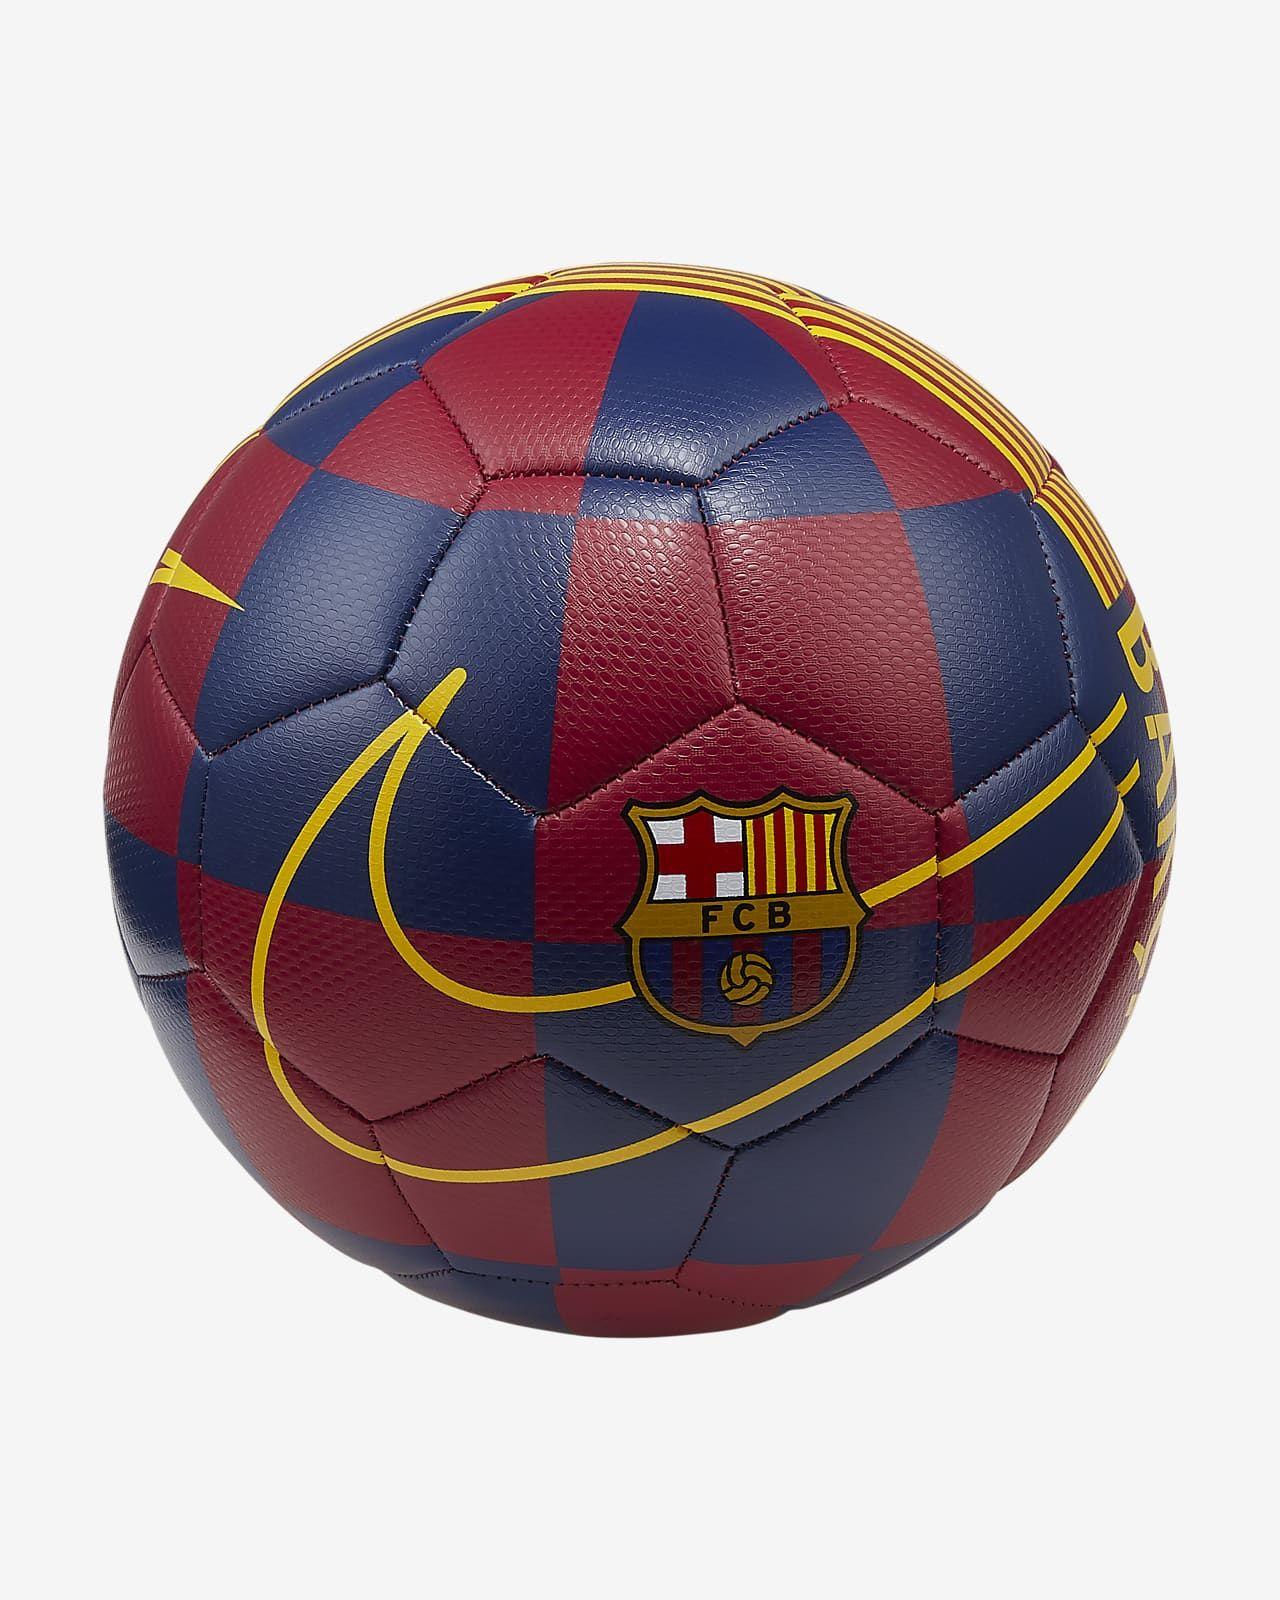 Ballon de football Nike Fc Barcelona Prestige Taille 5